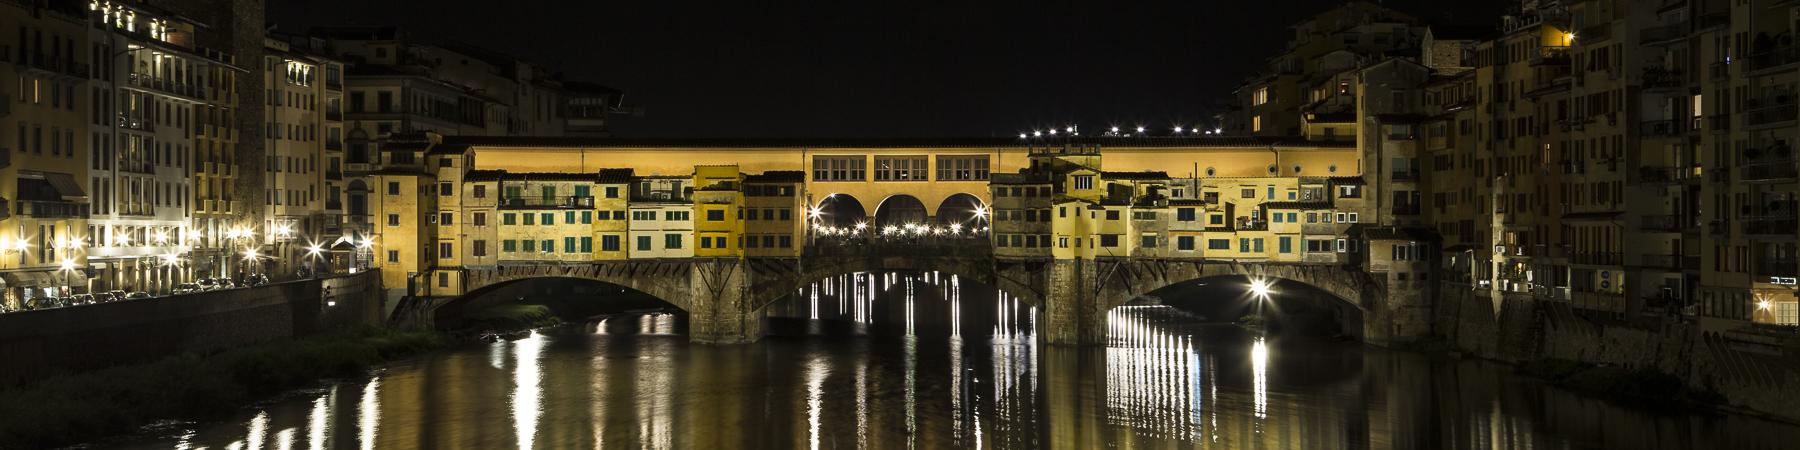 Ponte Vecchio-10.jpg